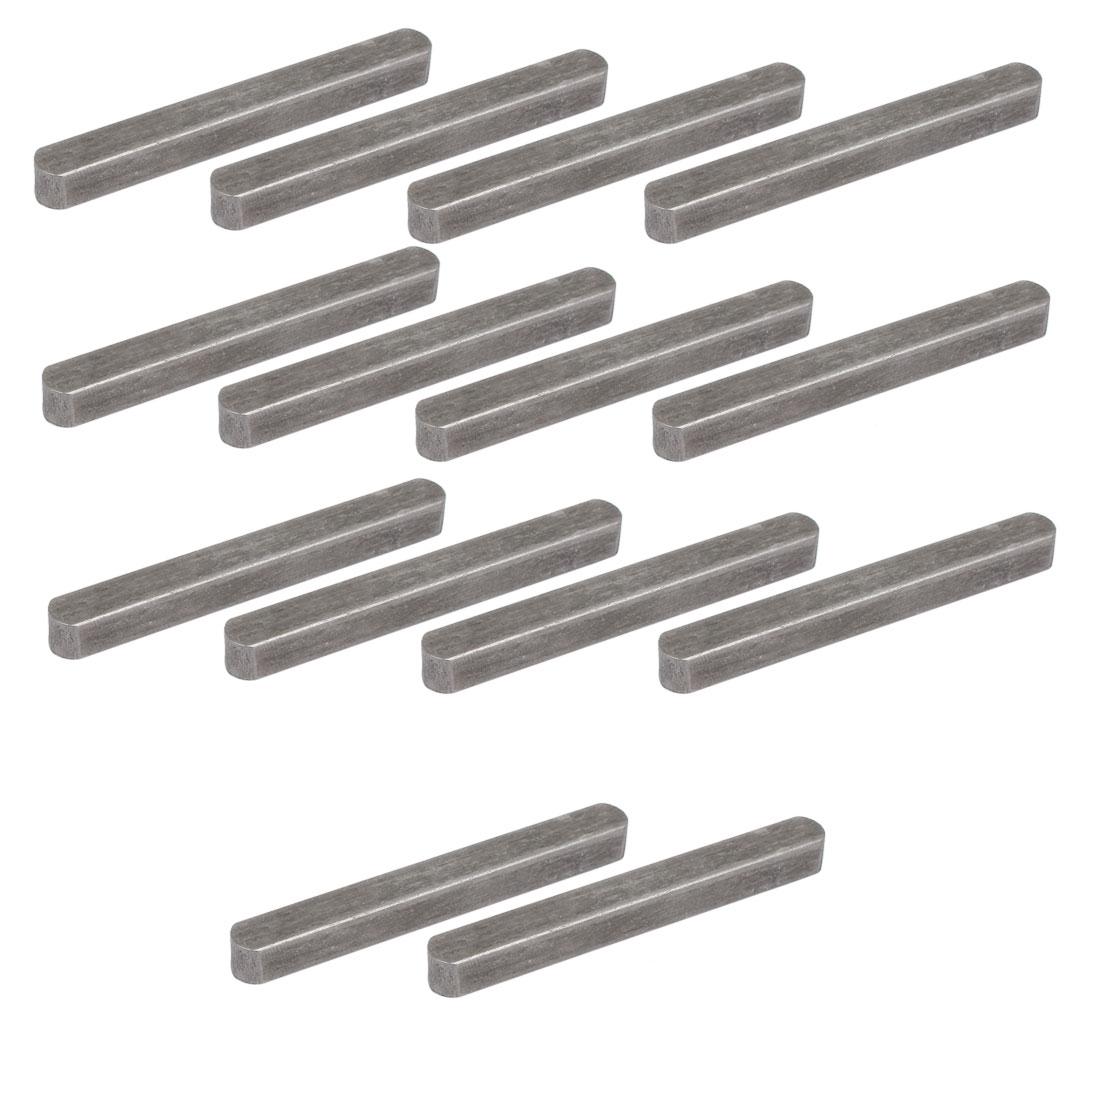 70mmx8mmx7mm Carbon Steel Key Stock To Lock Pulleys 14pcs